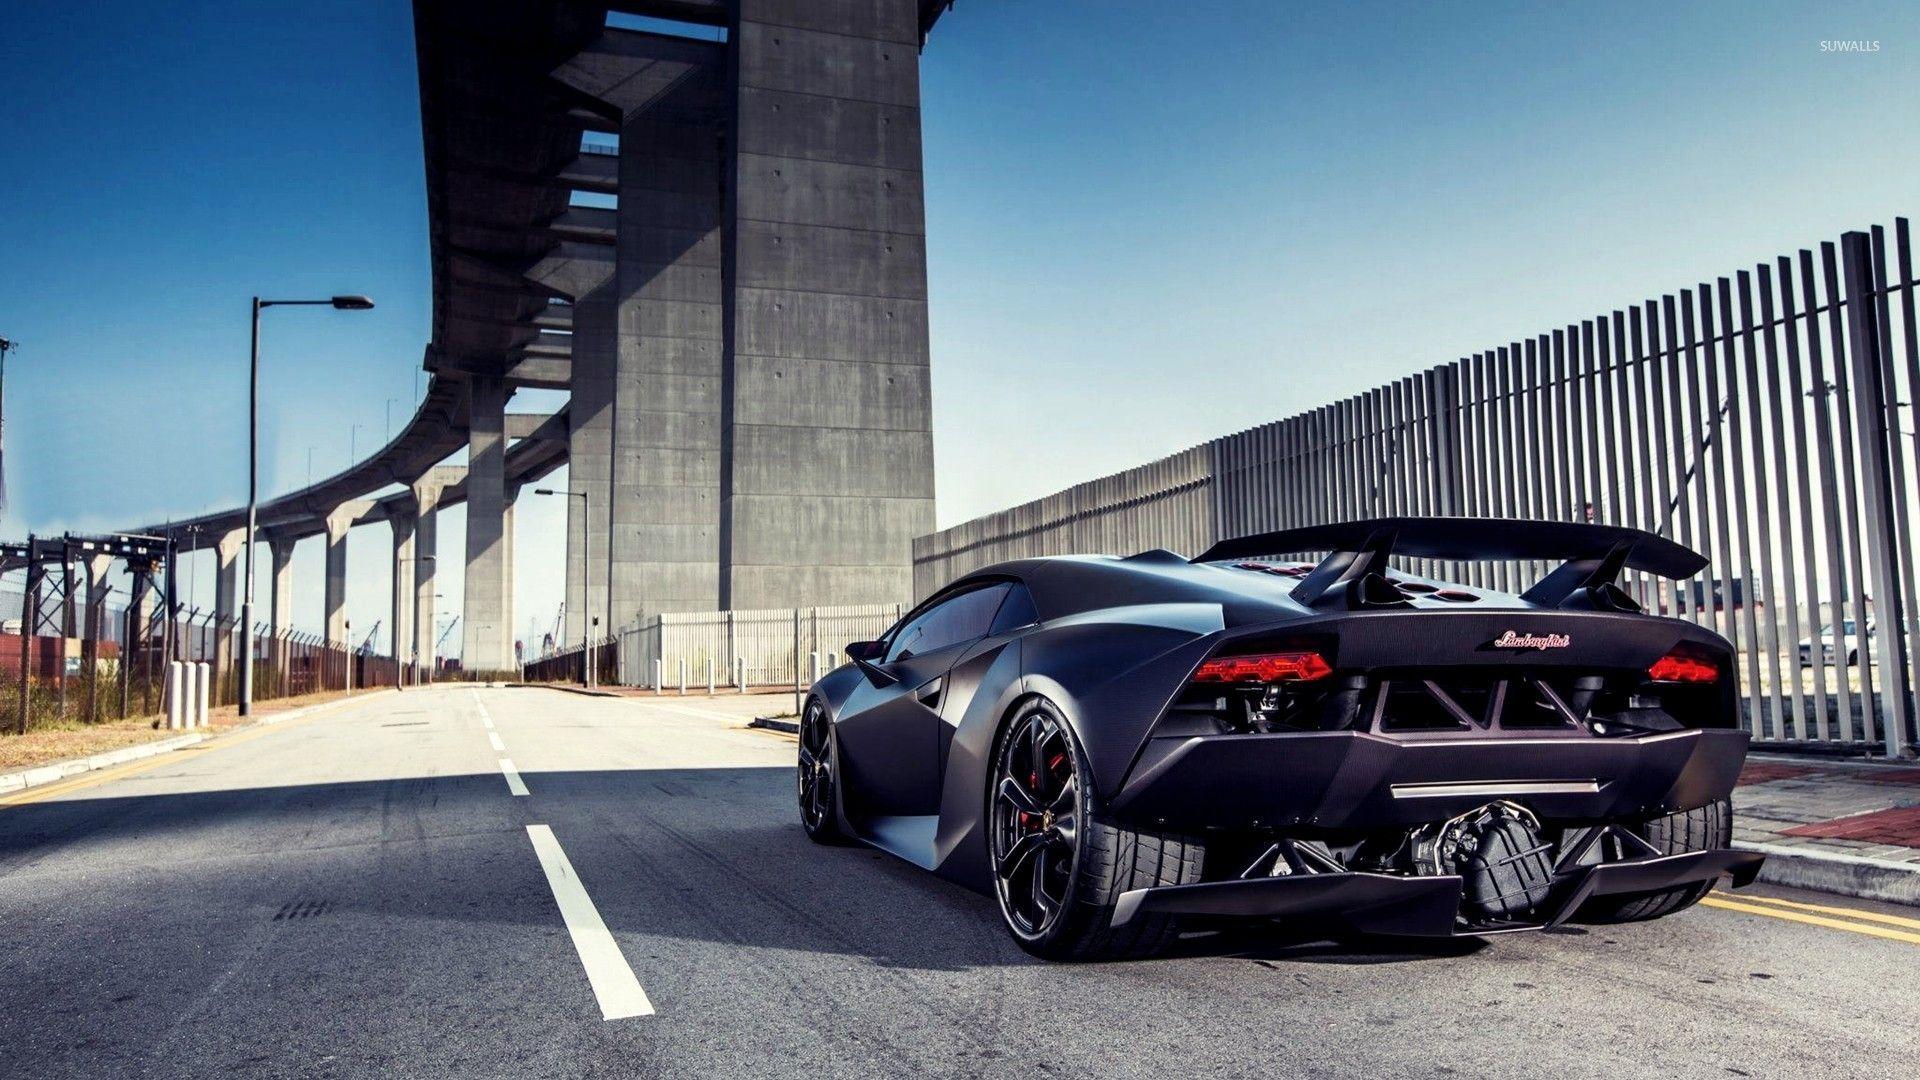 Lamborghini Urus SUV Concept At Beijing Auto Show Front